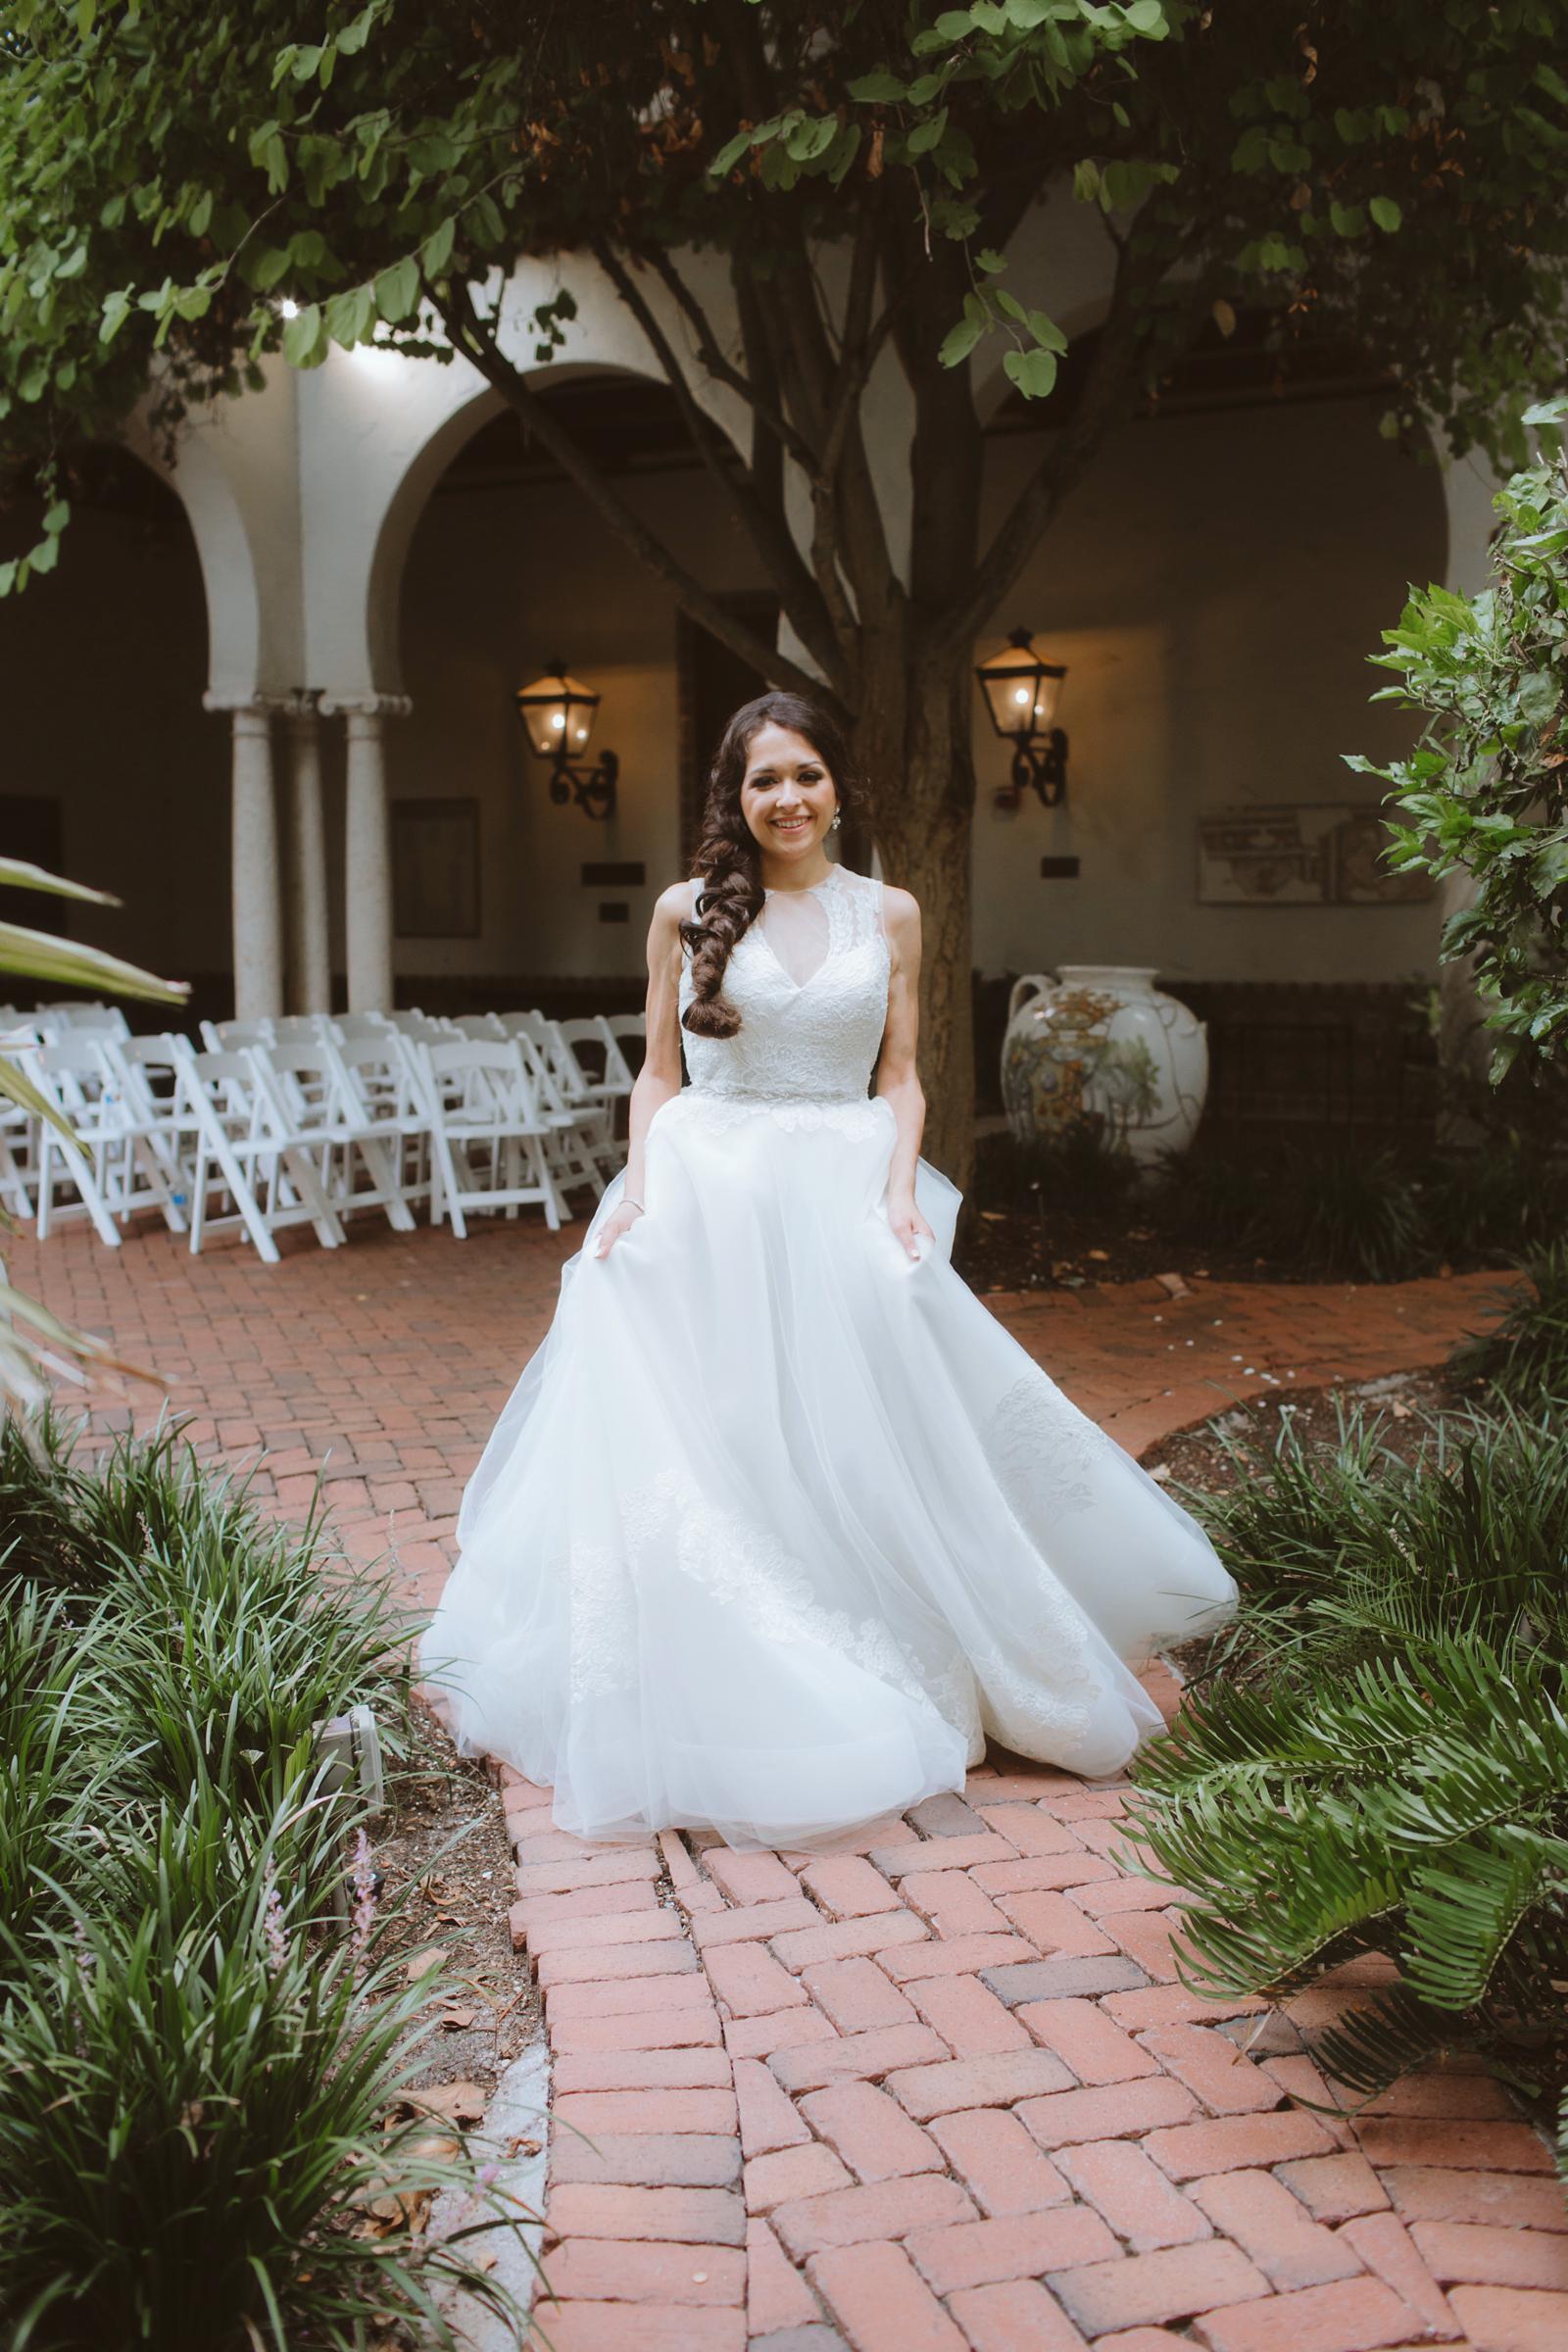 wedding day | MFA St Pete | Vanessa Boy Photography | vanessaboy.com-462.com |final.jpg